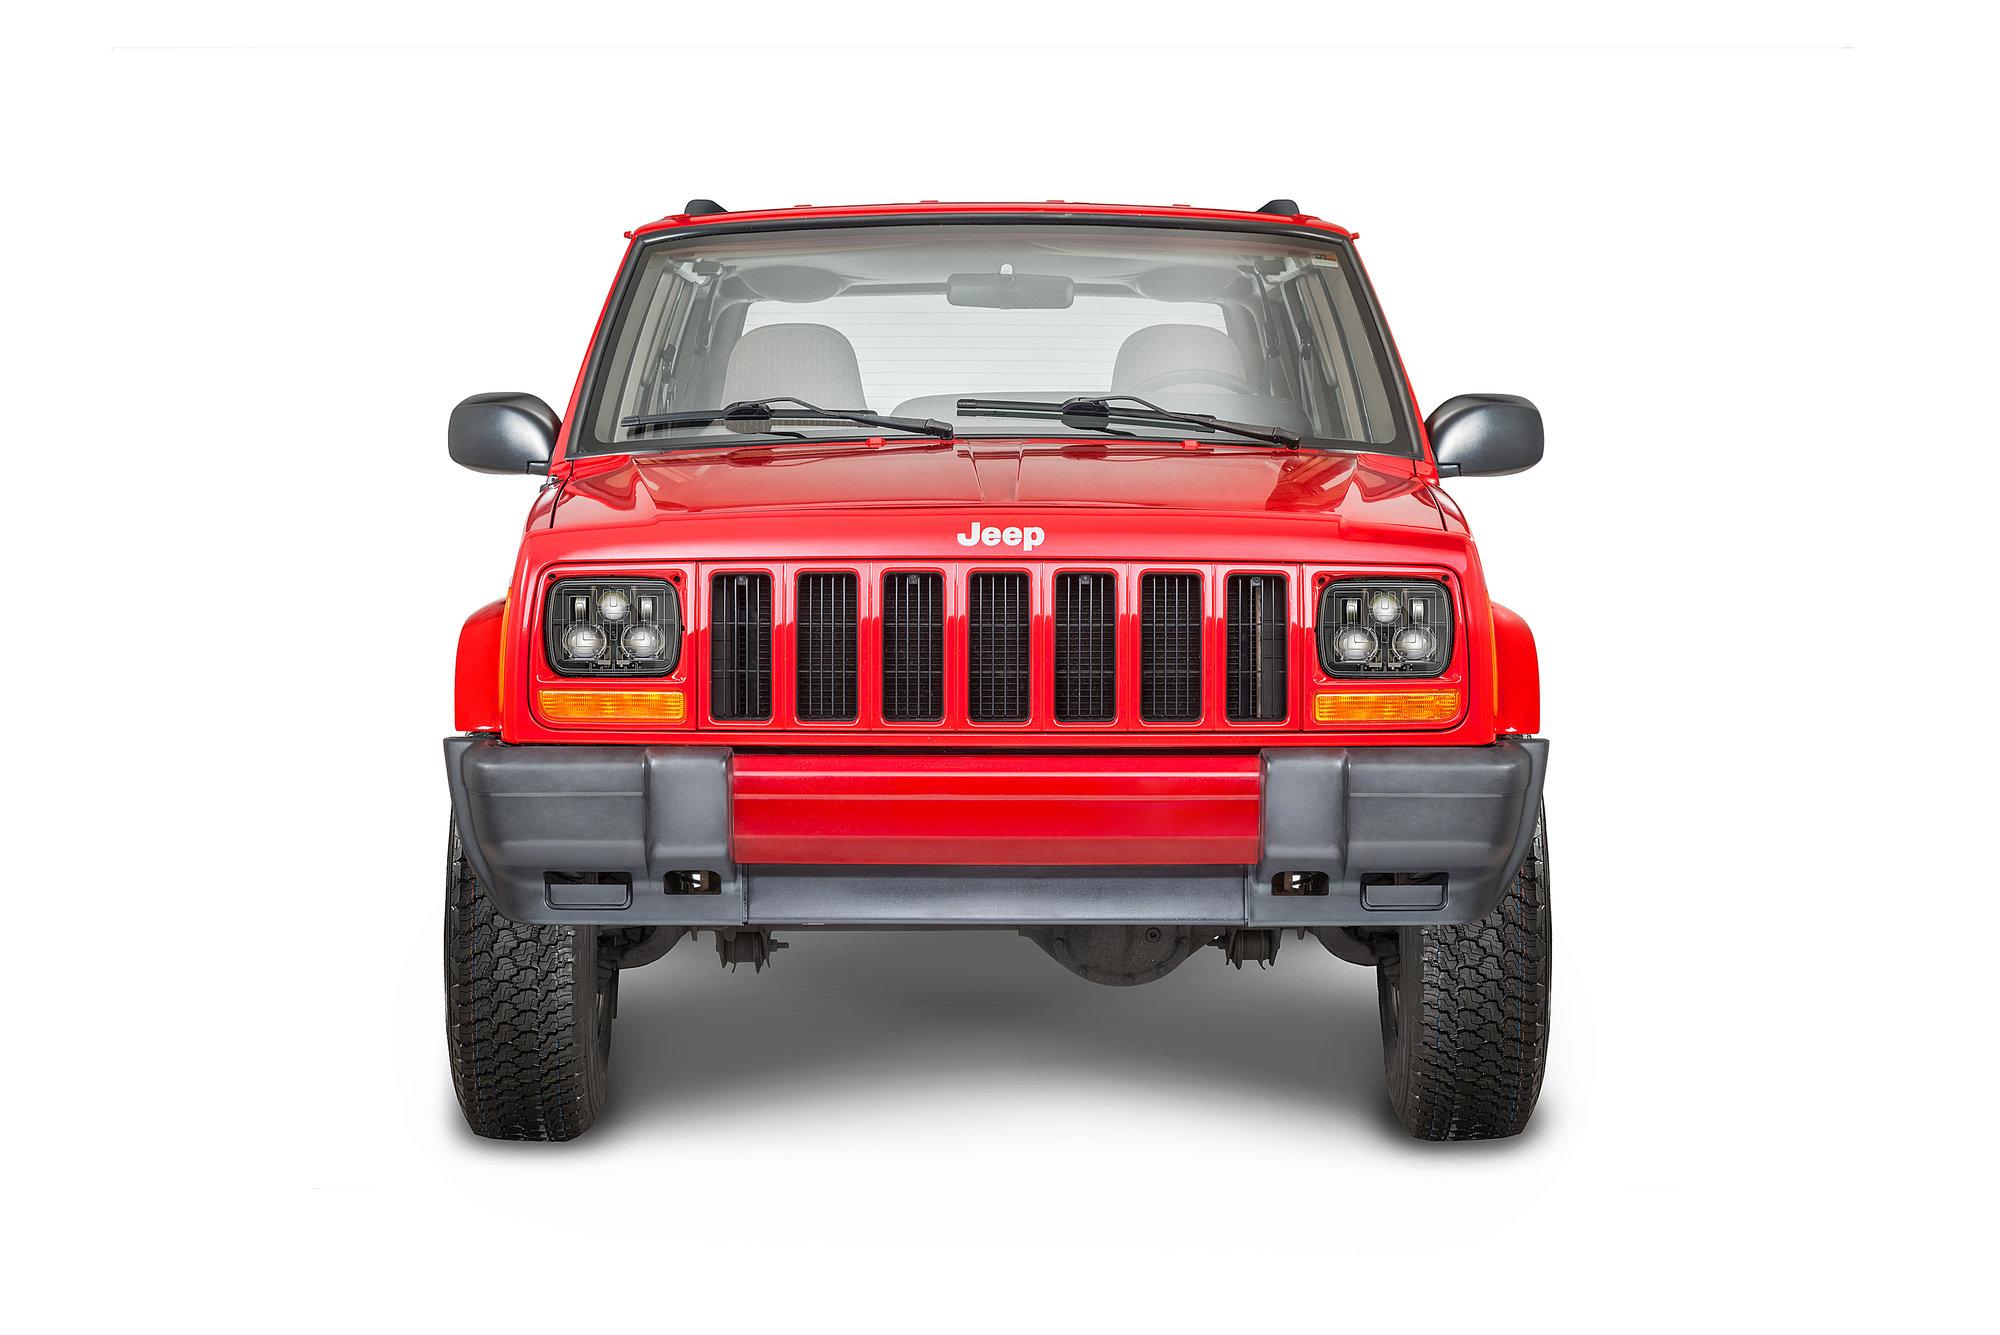 hight resolution of jeep xj halo headlights wiring wiring diagram perfomance jeep xj halo headlights wiring